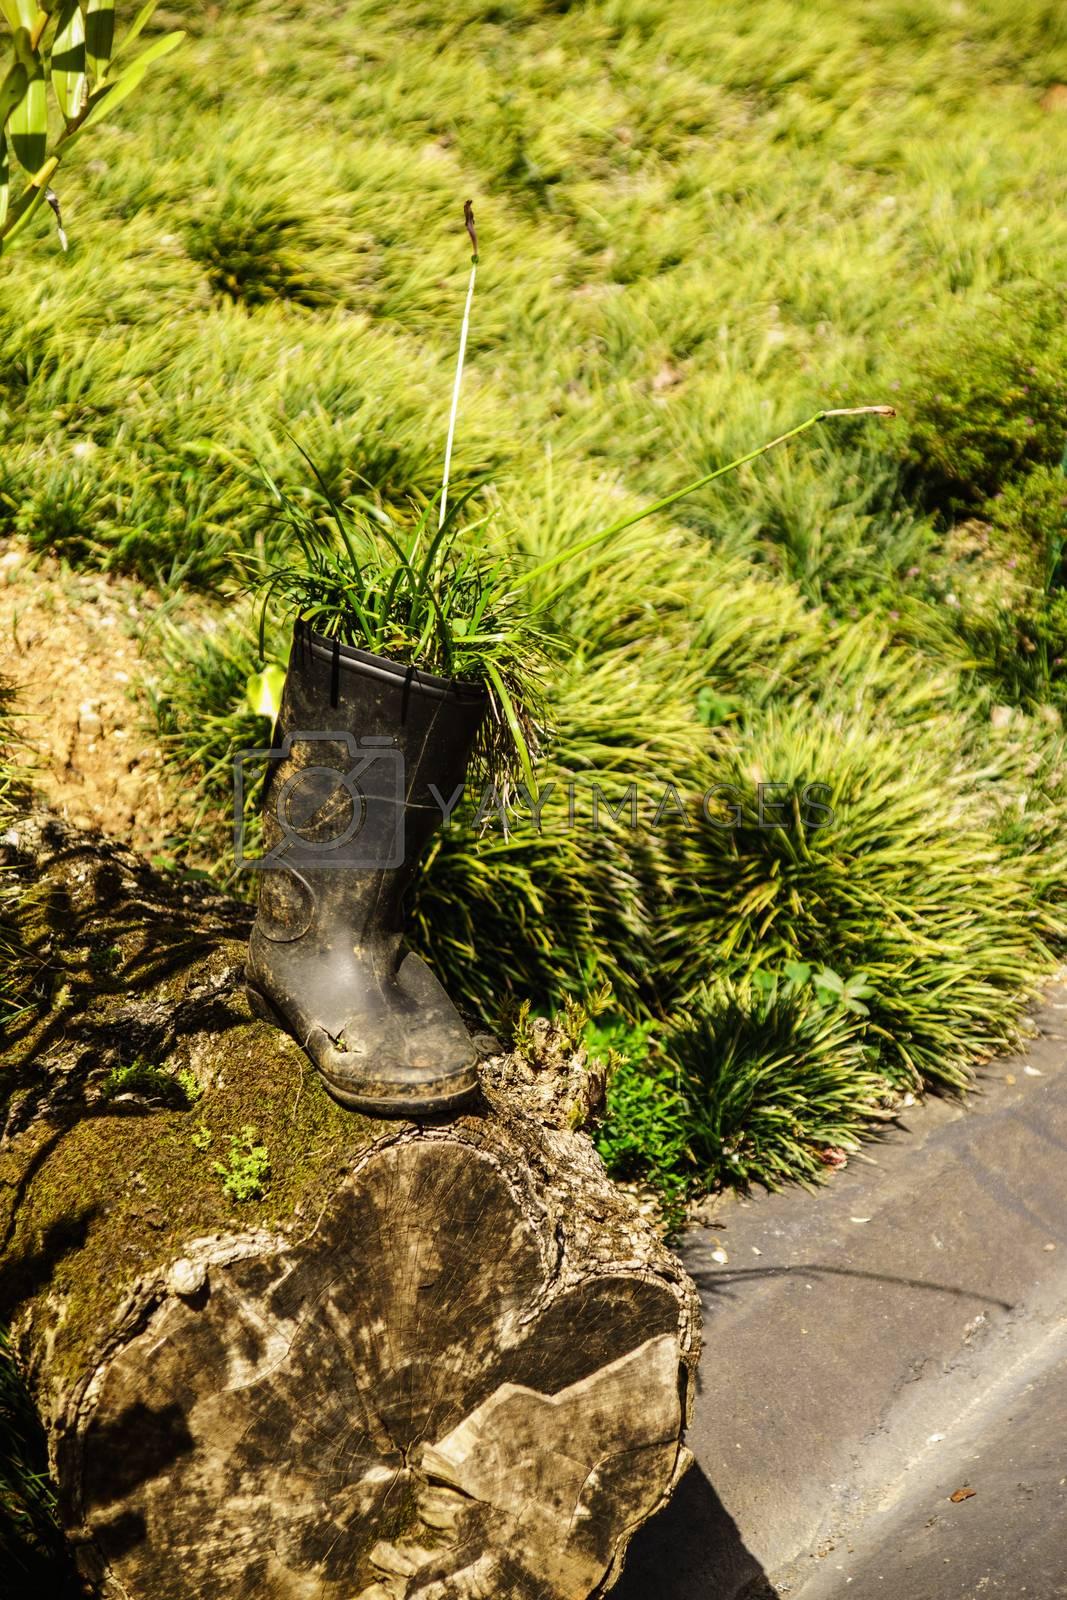 Royalty free image of boot in garden by nattapatt